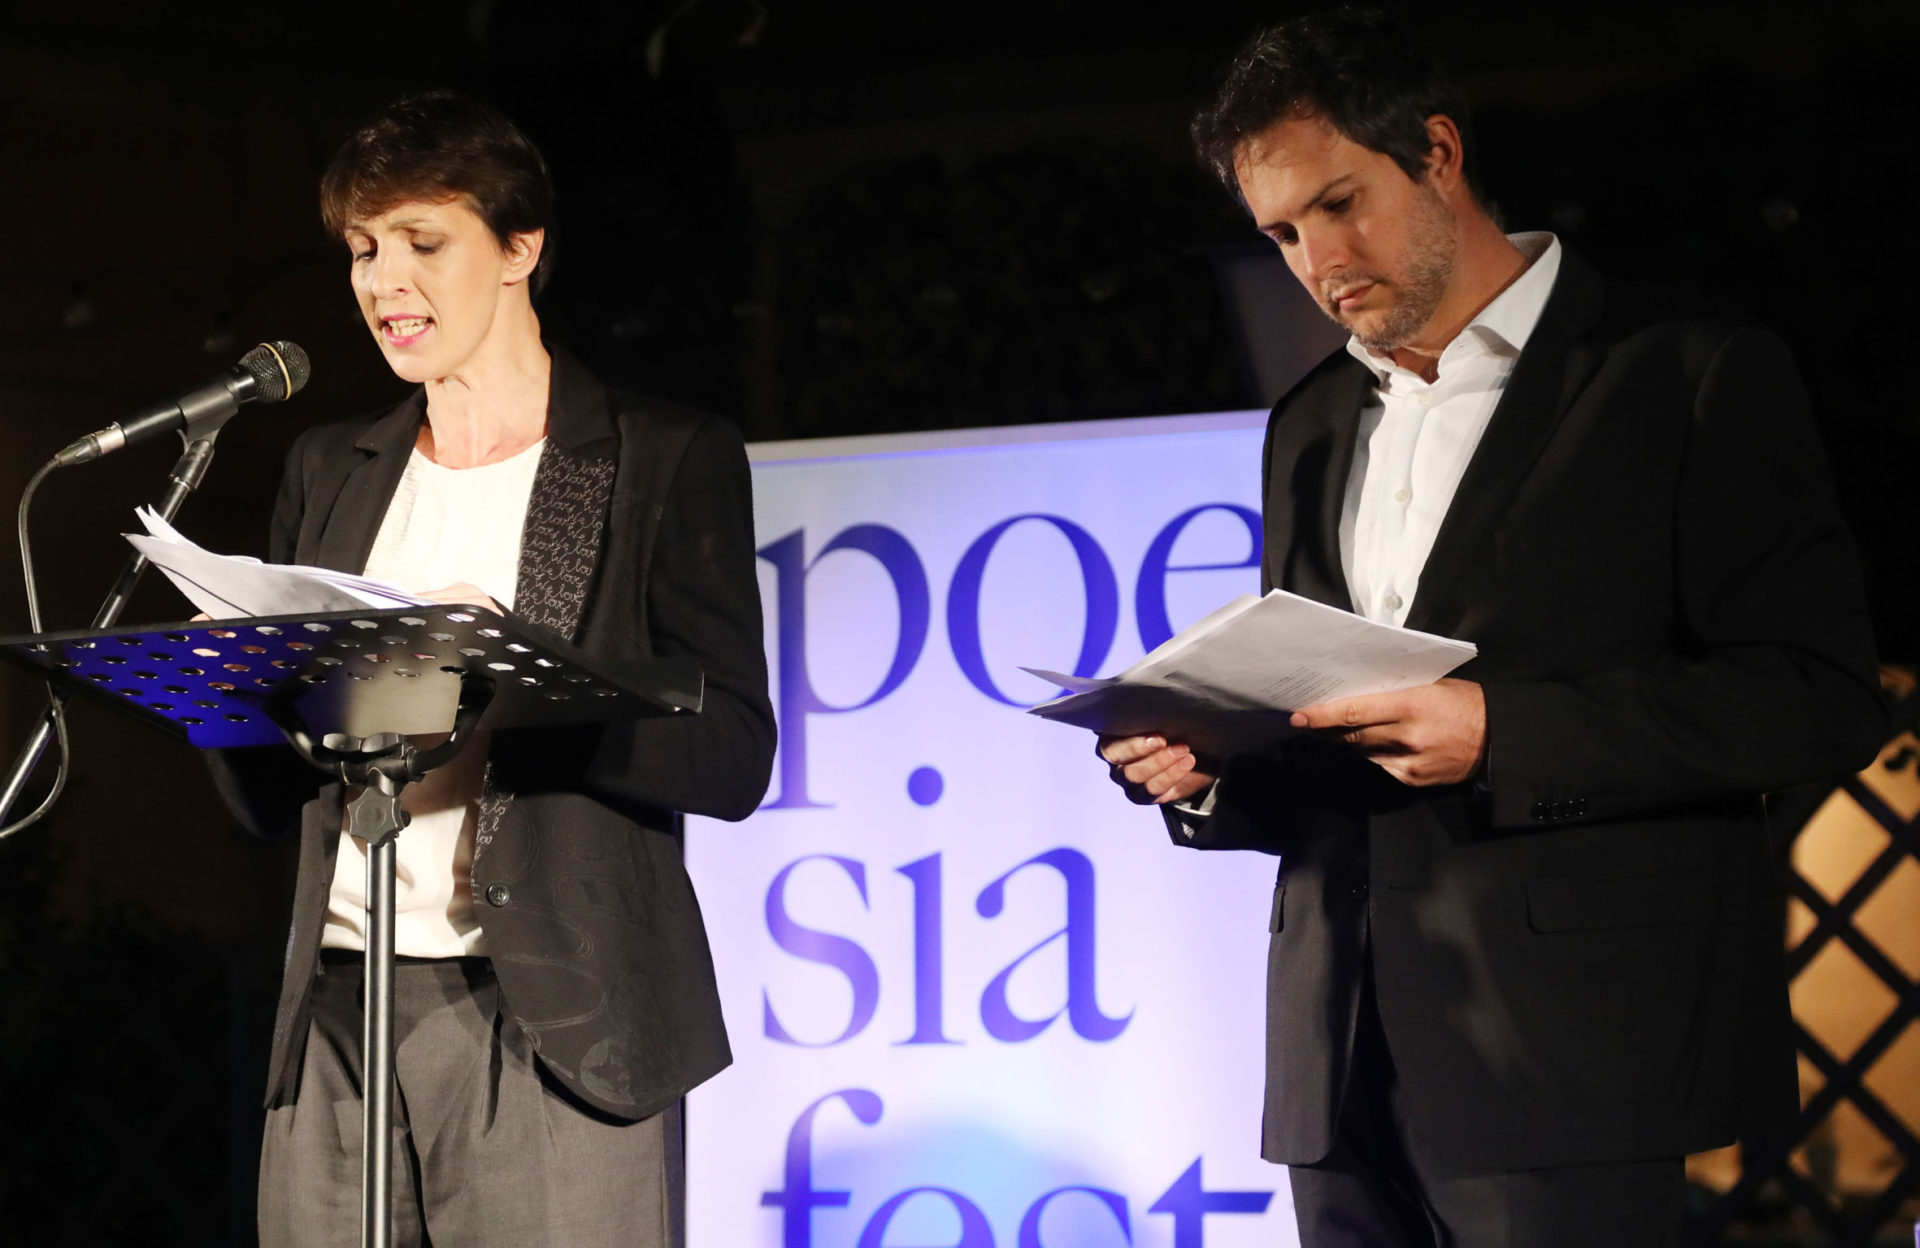 Diana Manea e Simone Francia - photo© Elisabetta Baracchi